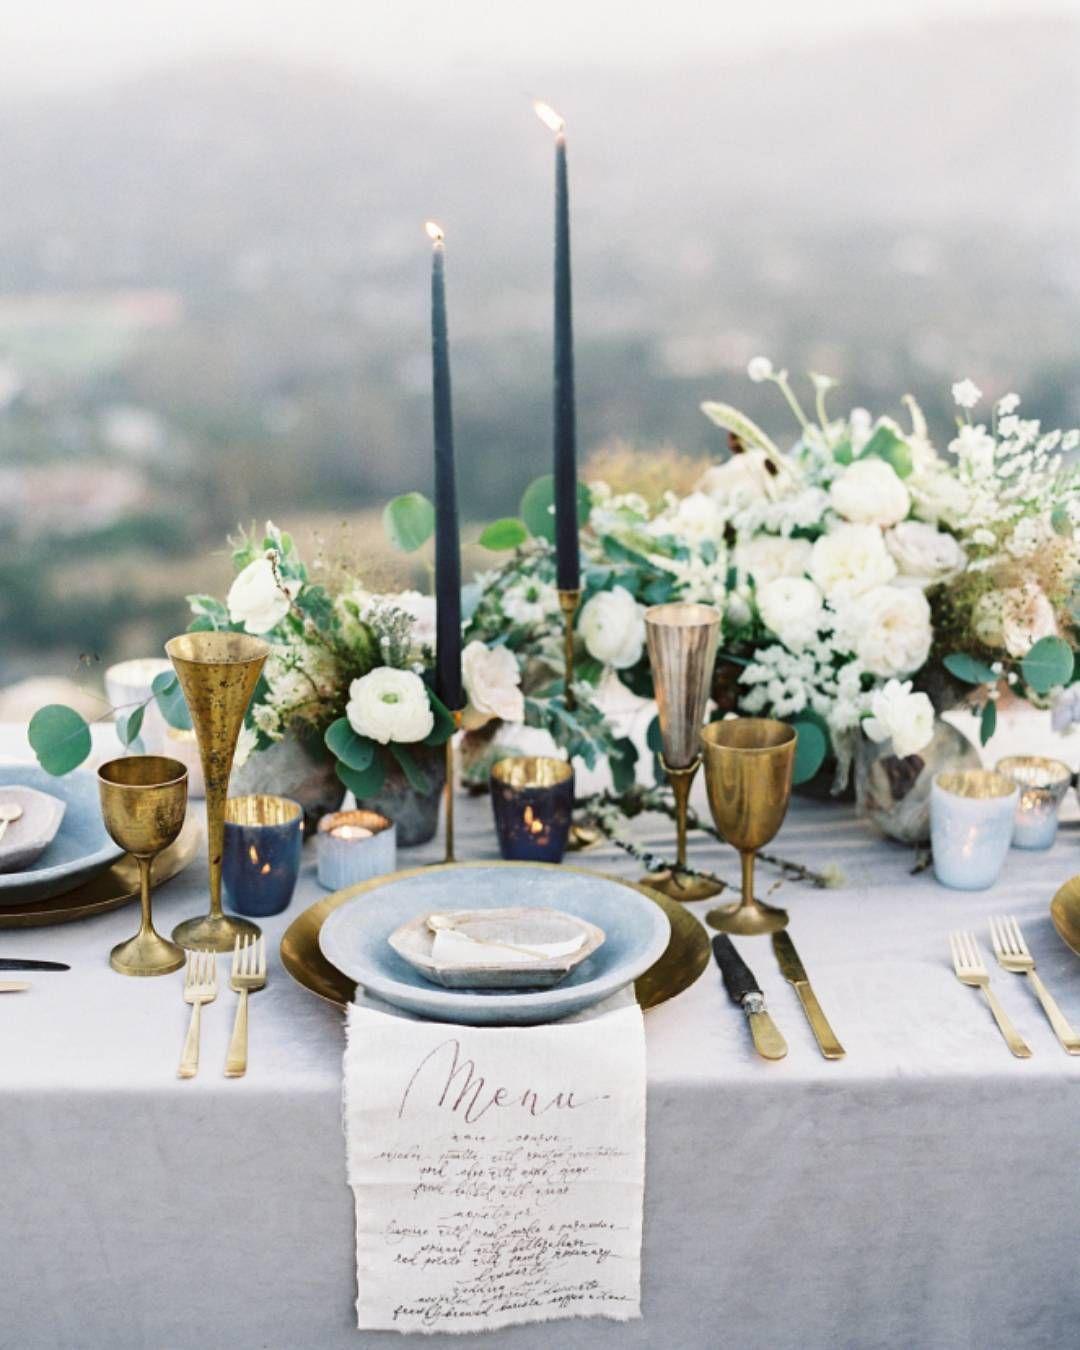 The soft pastel hues and elegant bohemian